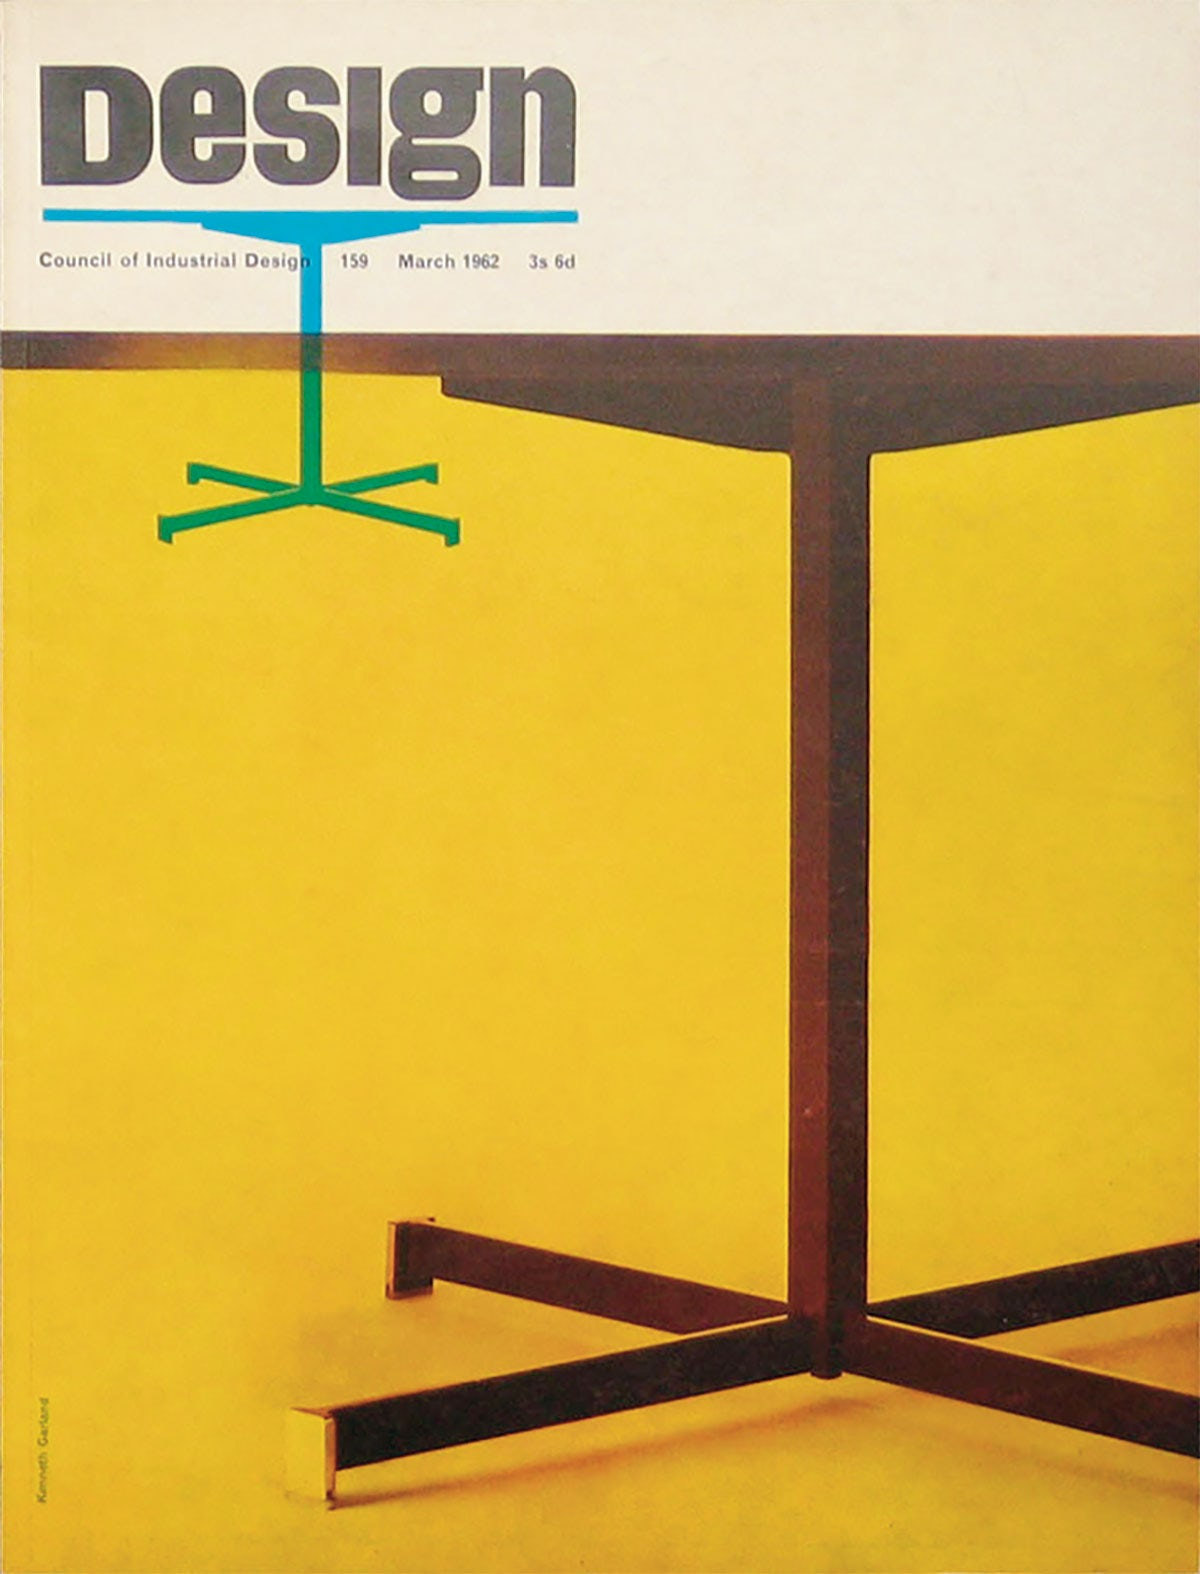 NARAN-HO Design Ken Garland Diseño web Marbella design